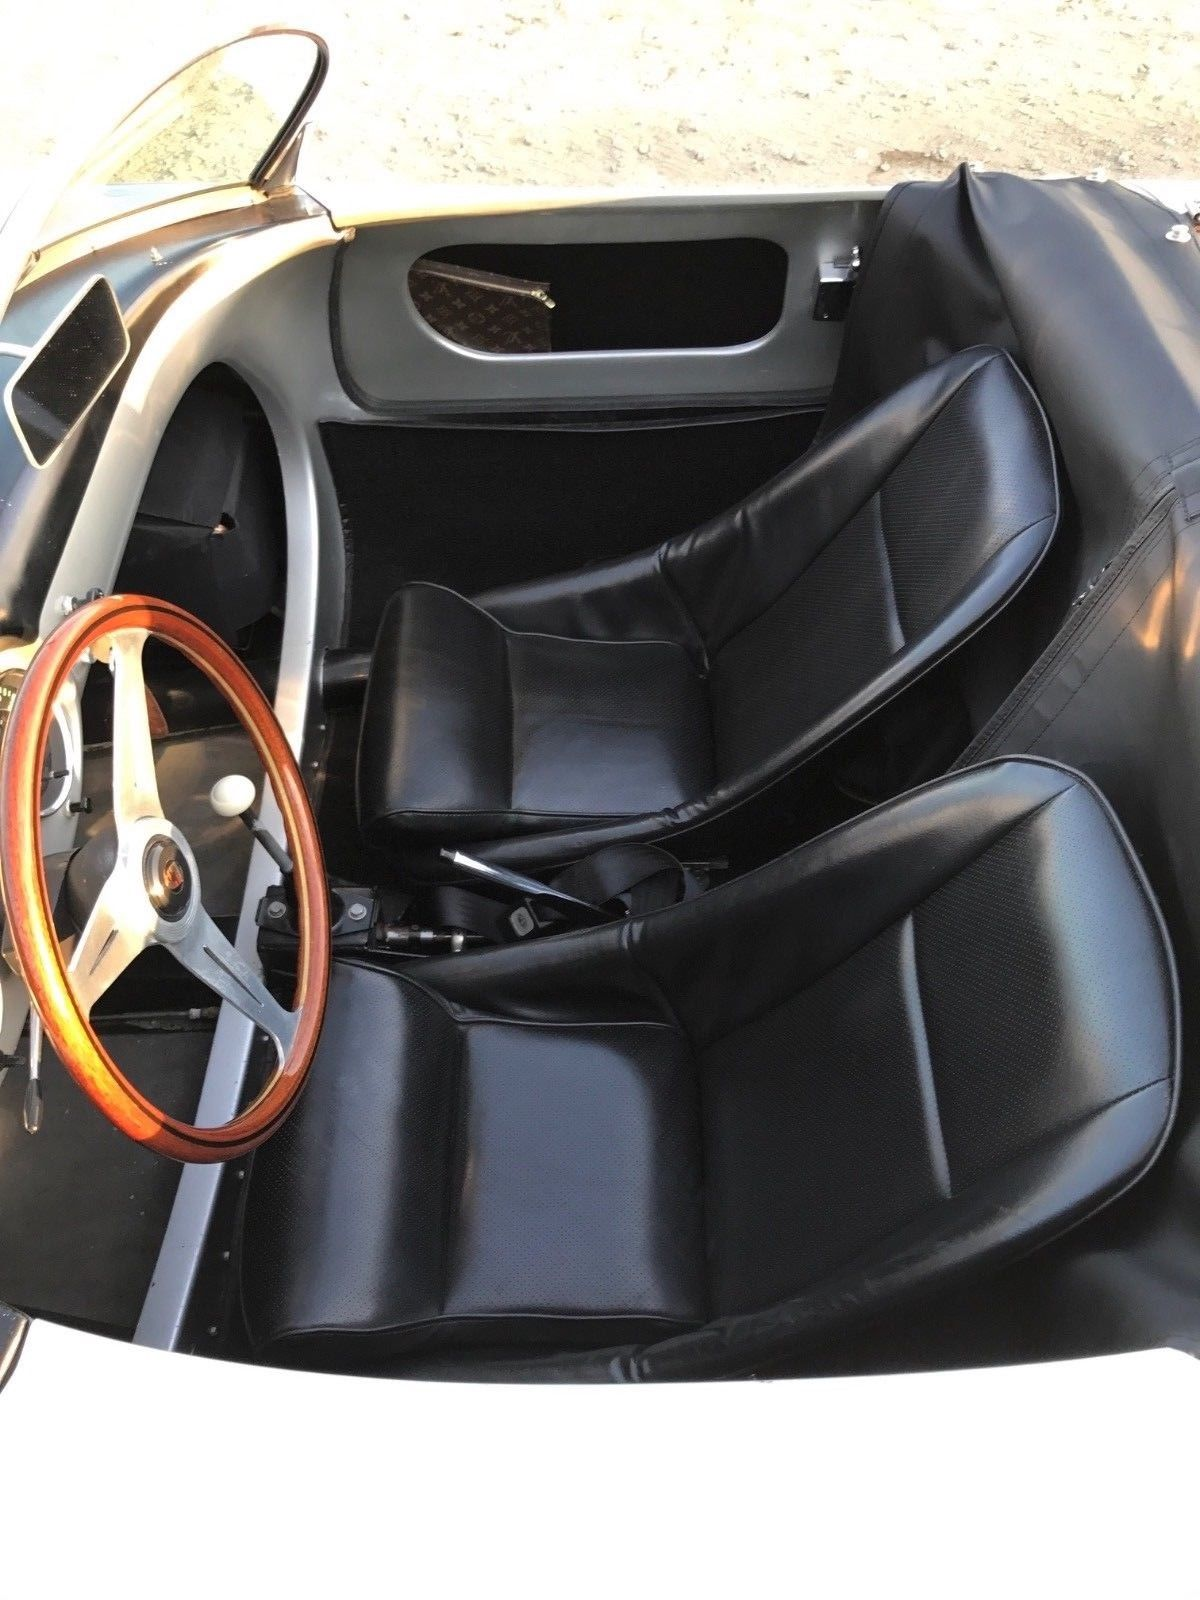 Beck Porsche 550 interior view